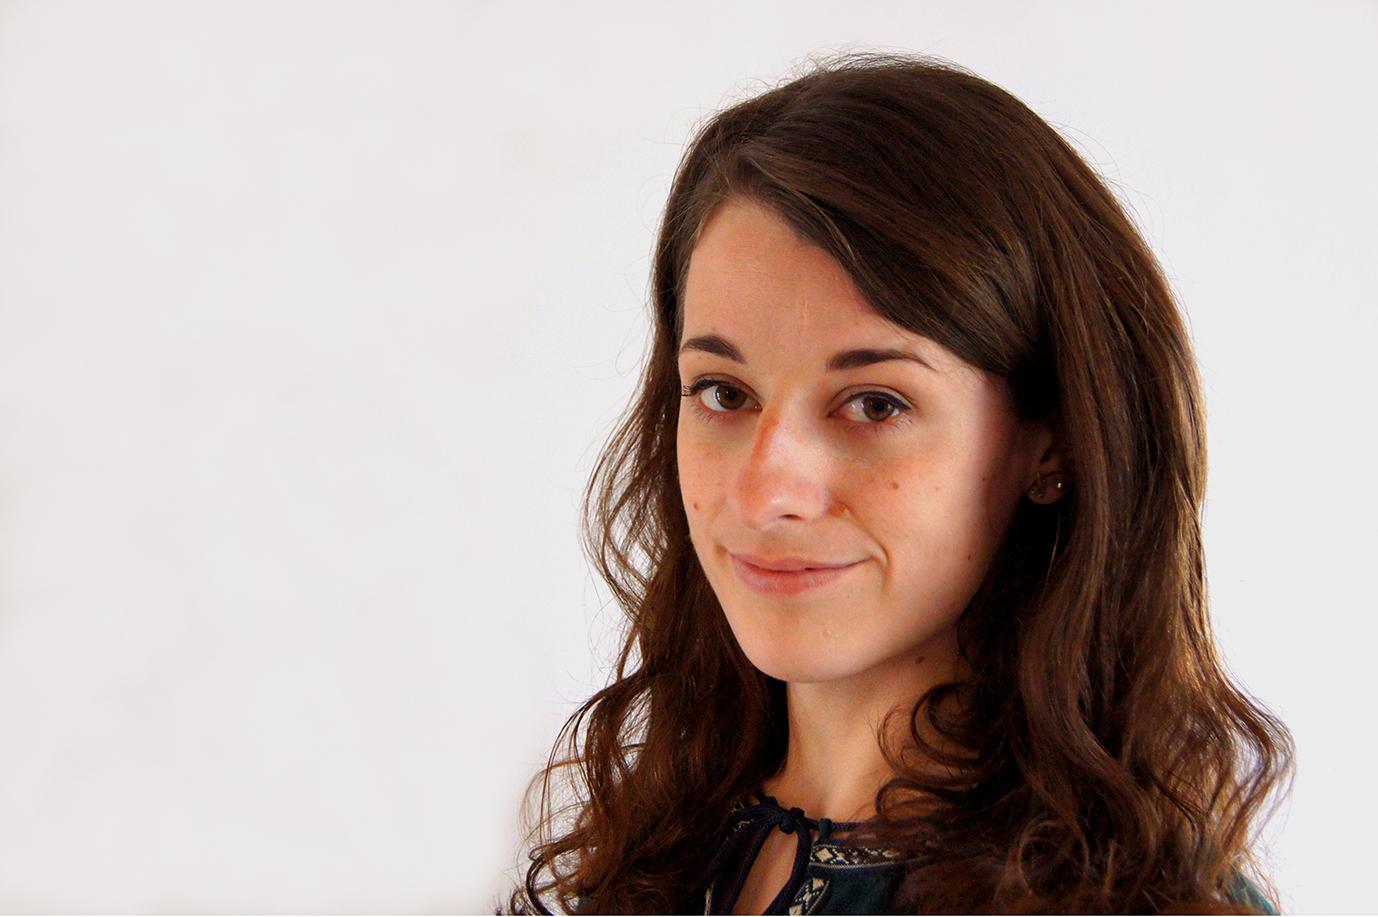 Ann-Kathrin Binot